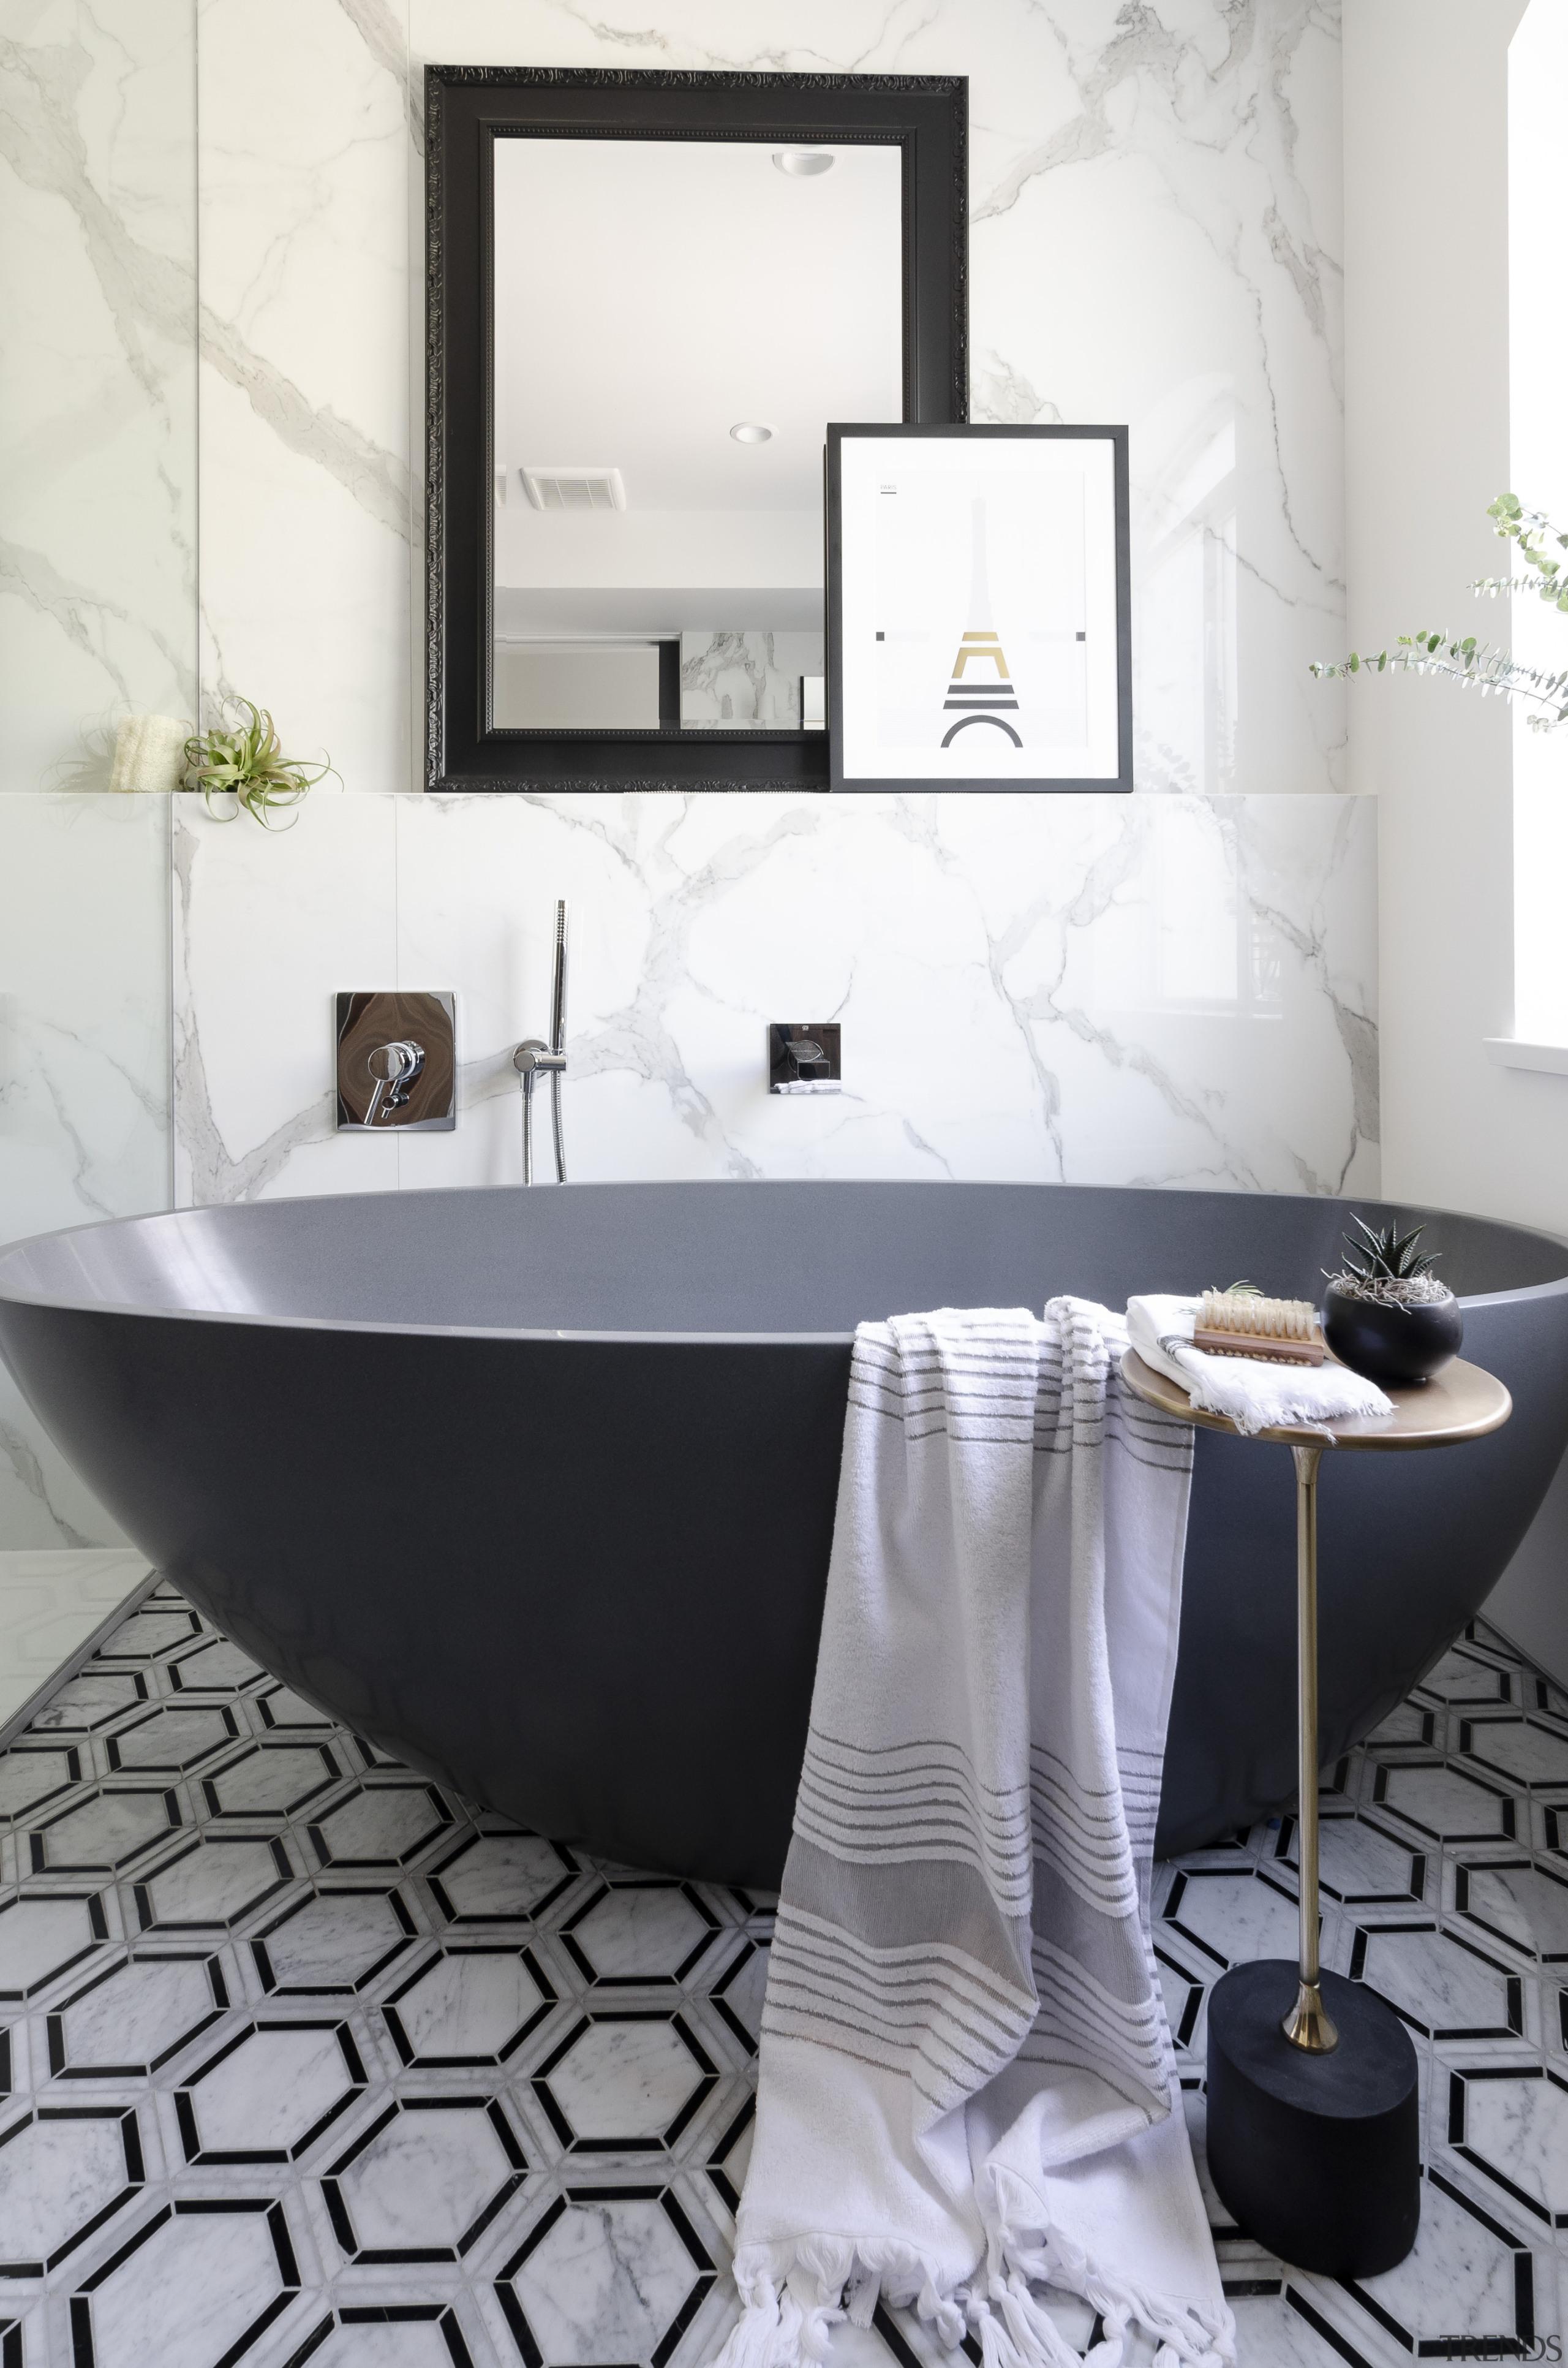 A honed bluestone freestanding tub adds a modern